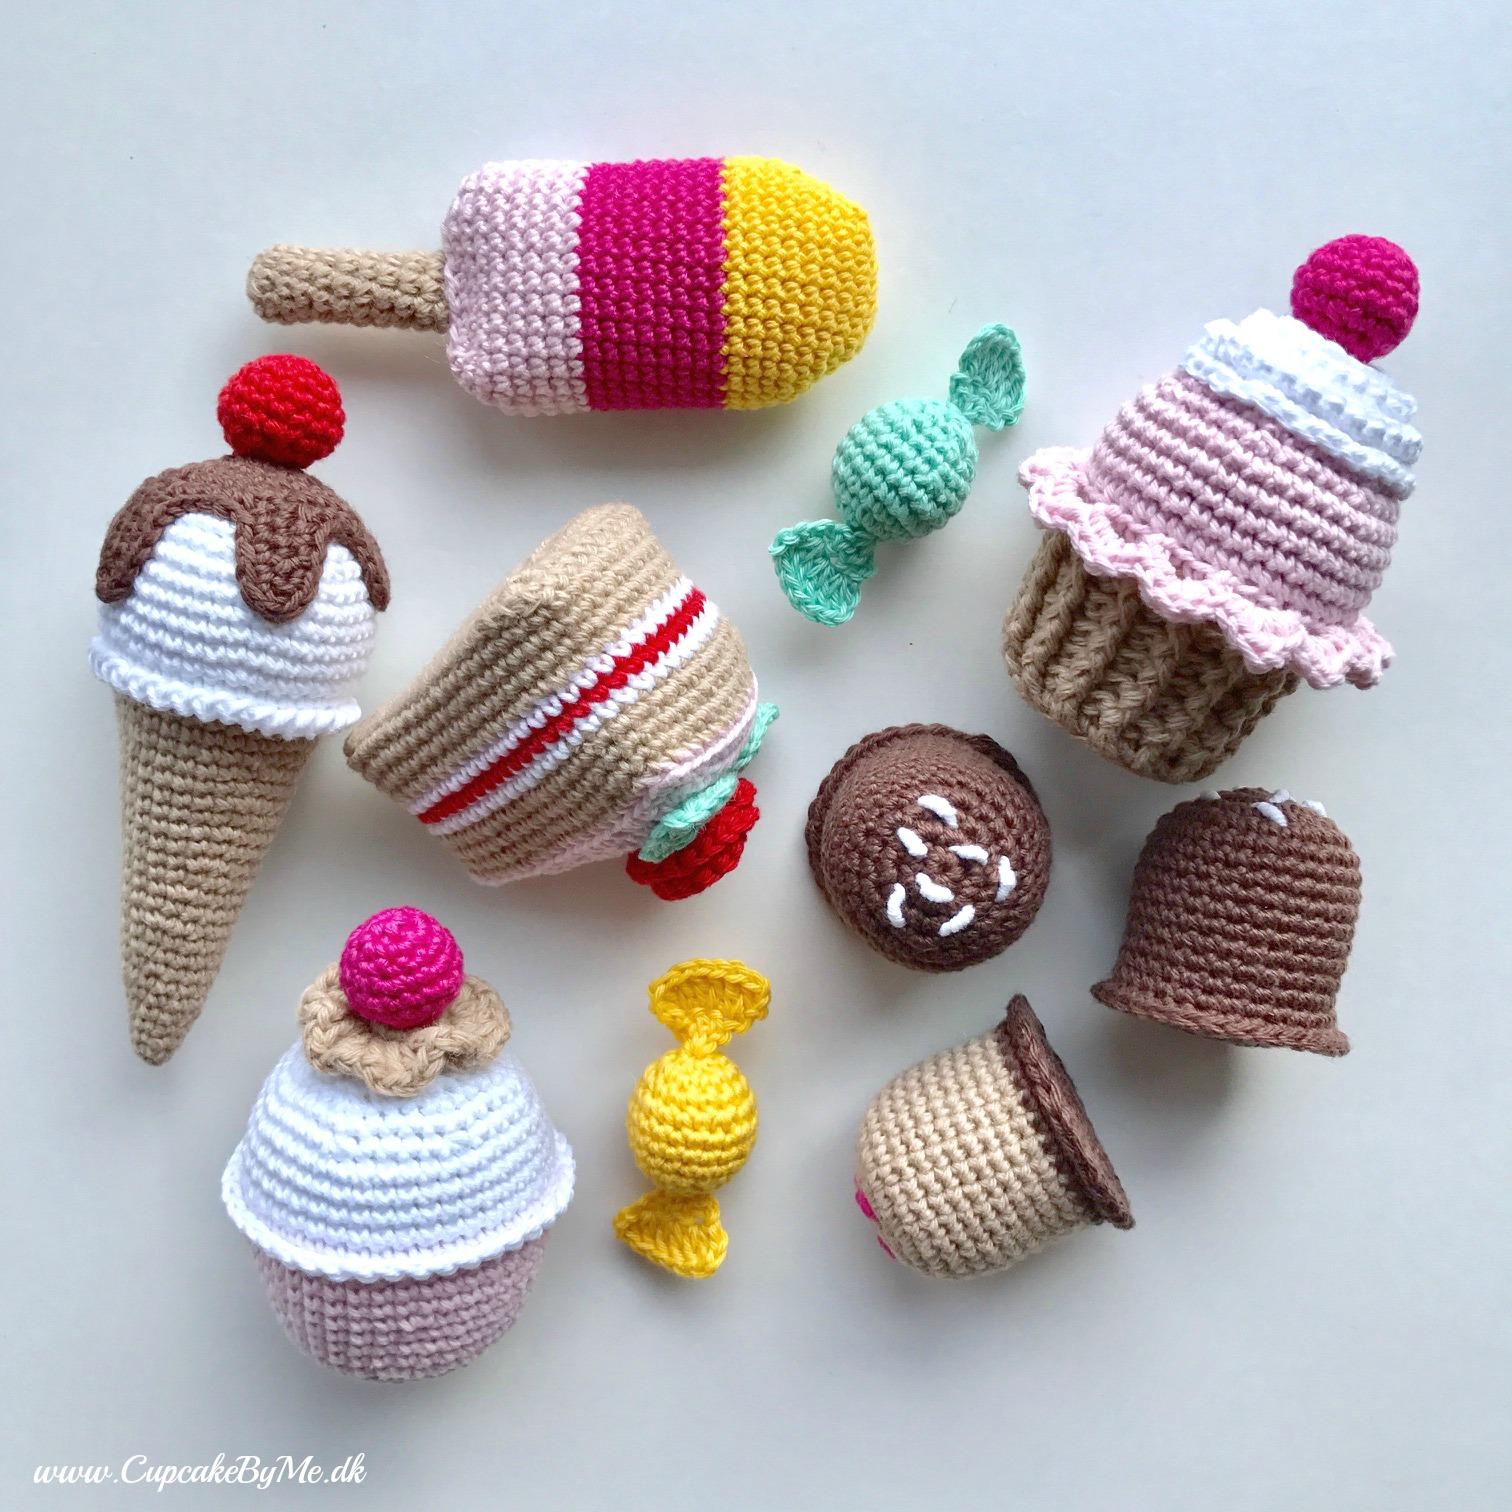 Cupcake By Me Blog Hæklekits I Netto